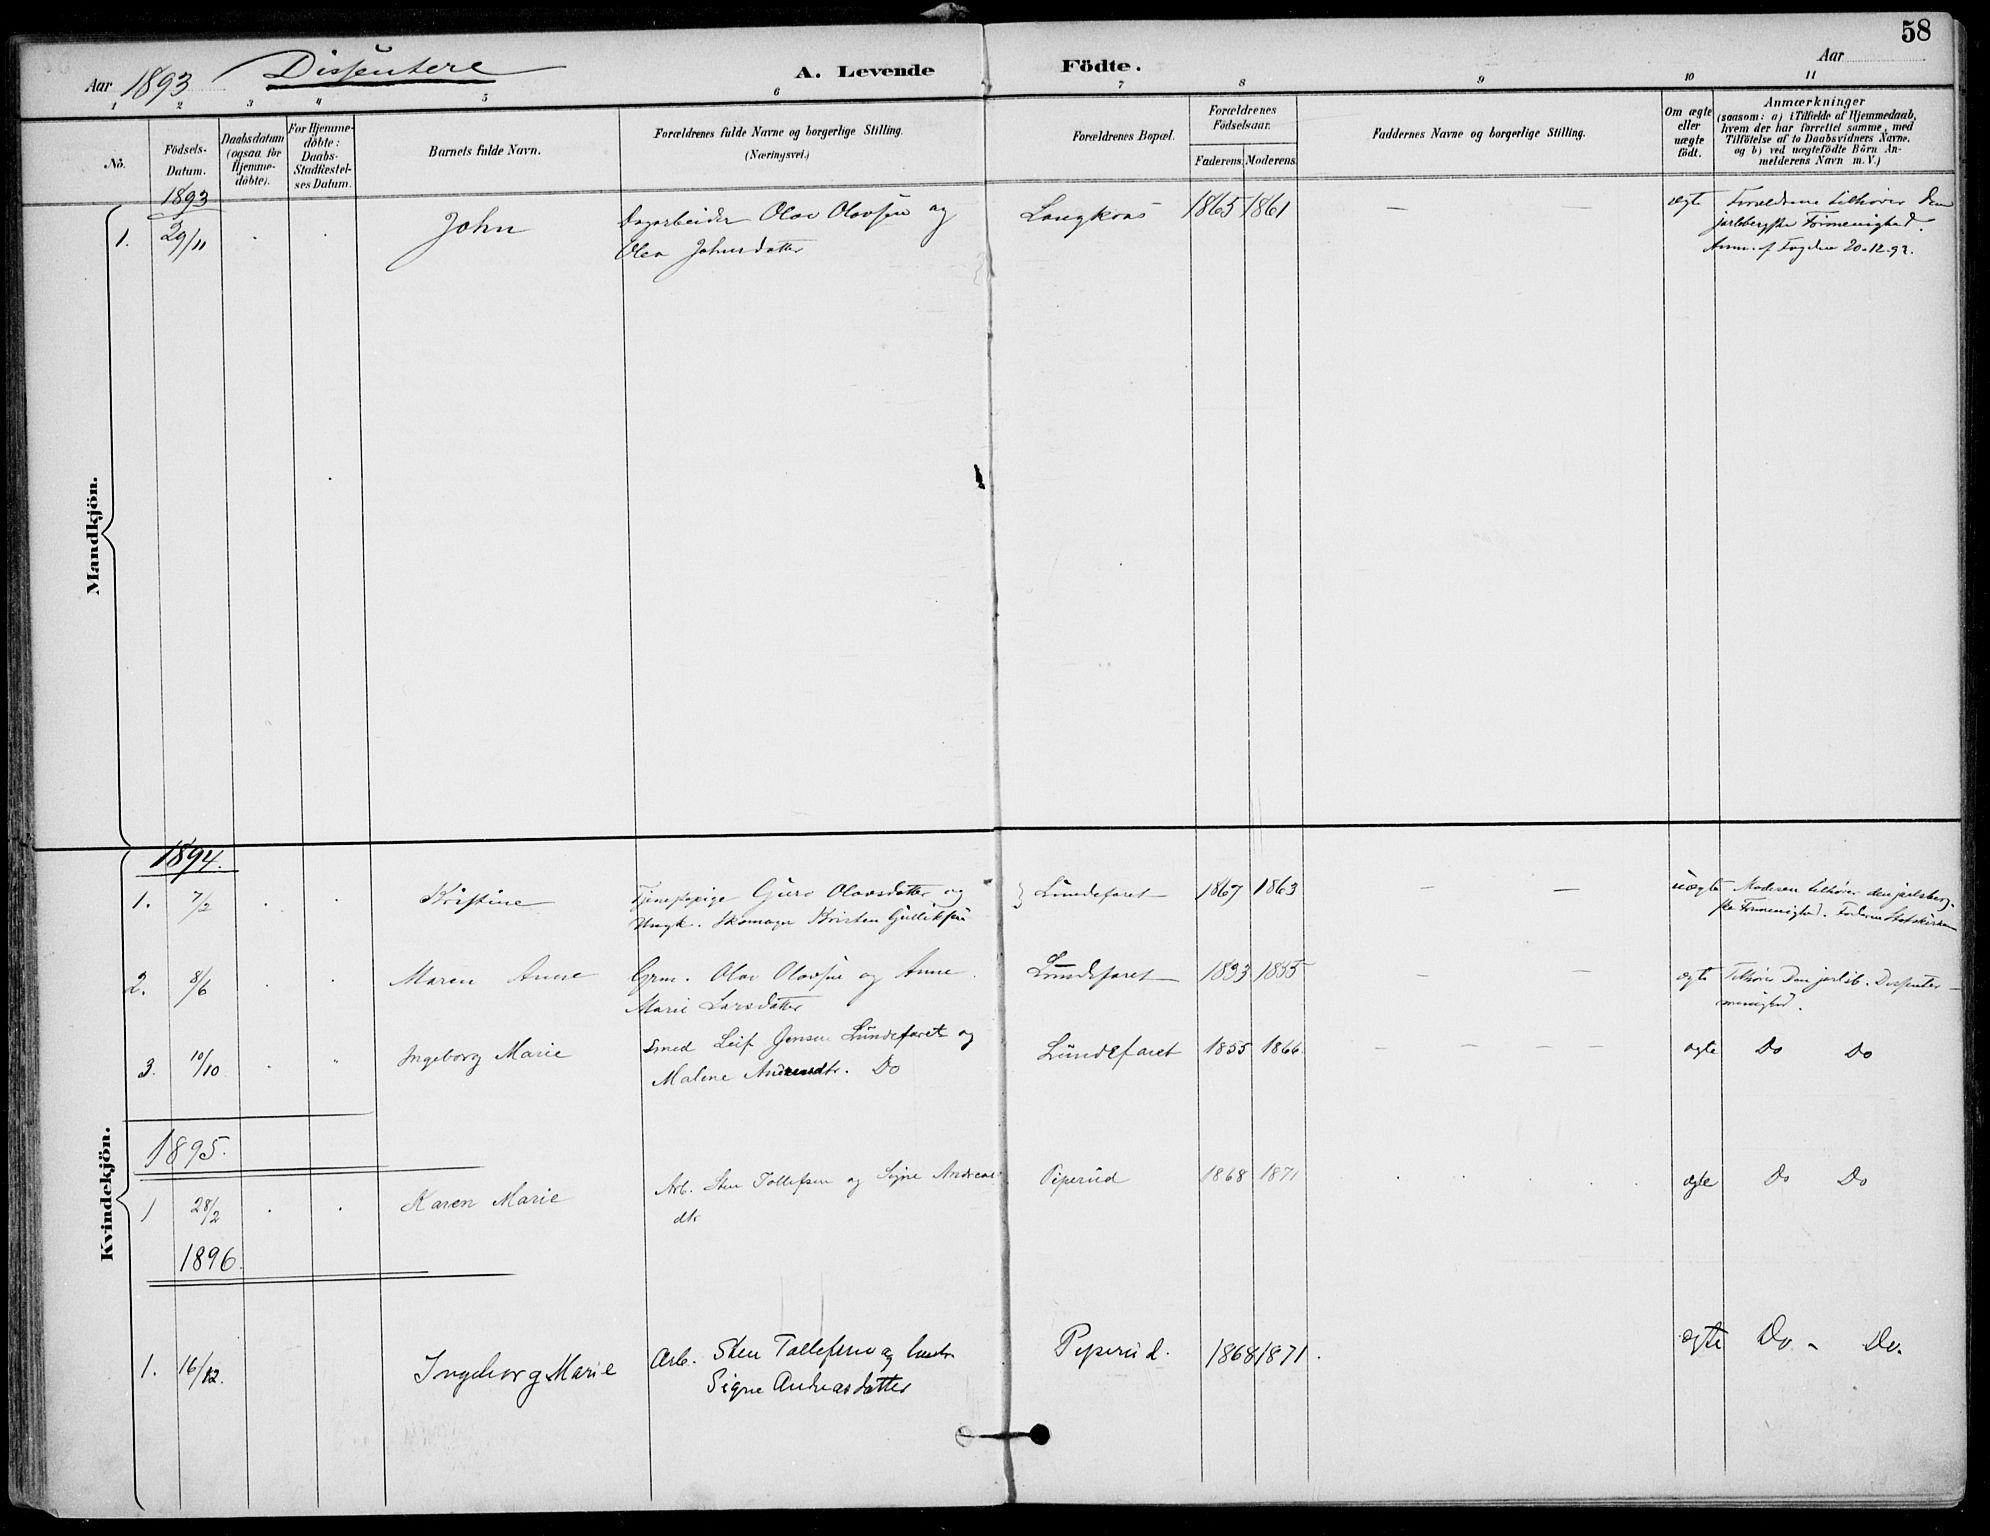 SAKO, Lunde kirkebøker, F/Fa/L0003: Ministerialbok nr. I 3, 1893-1902, s. 58